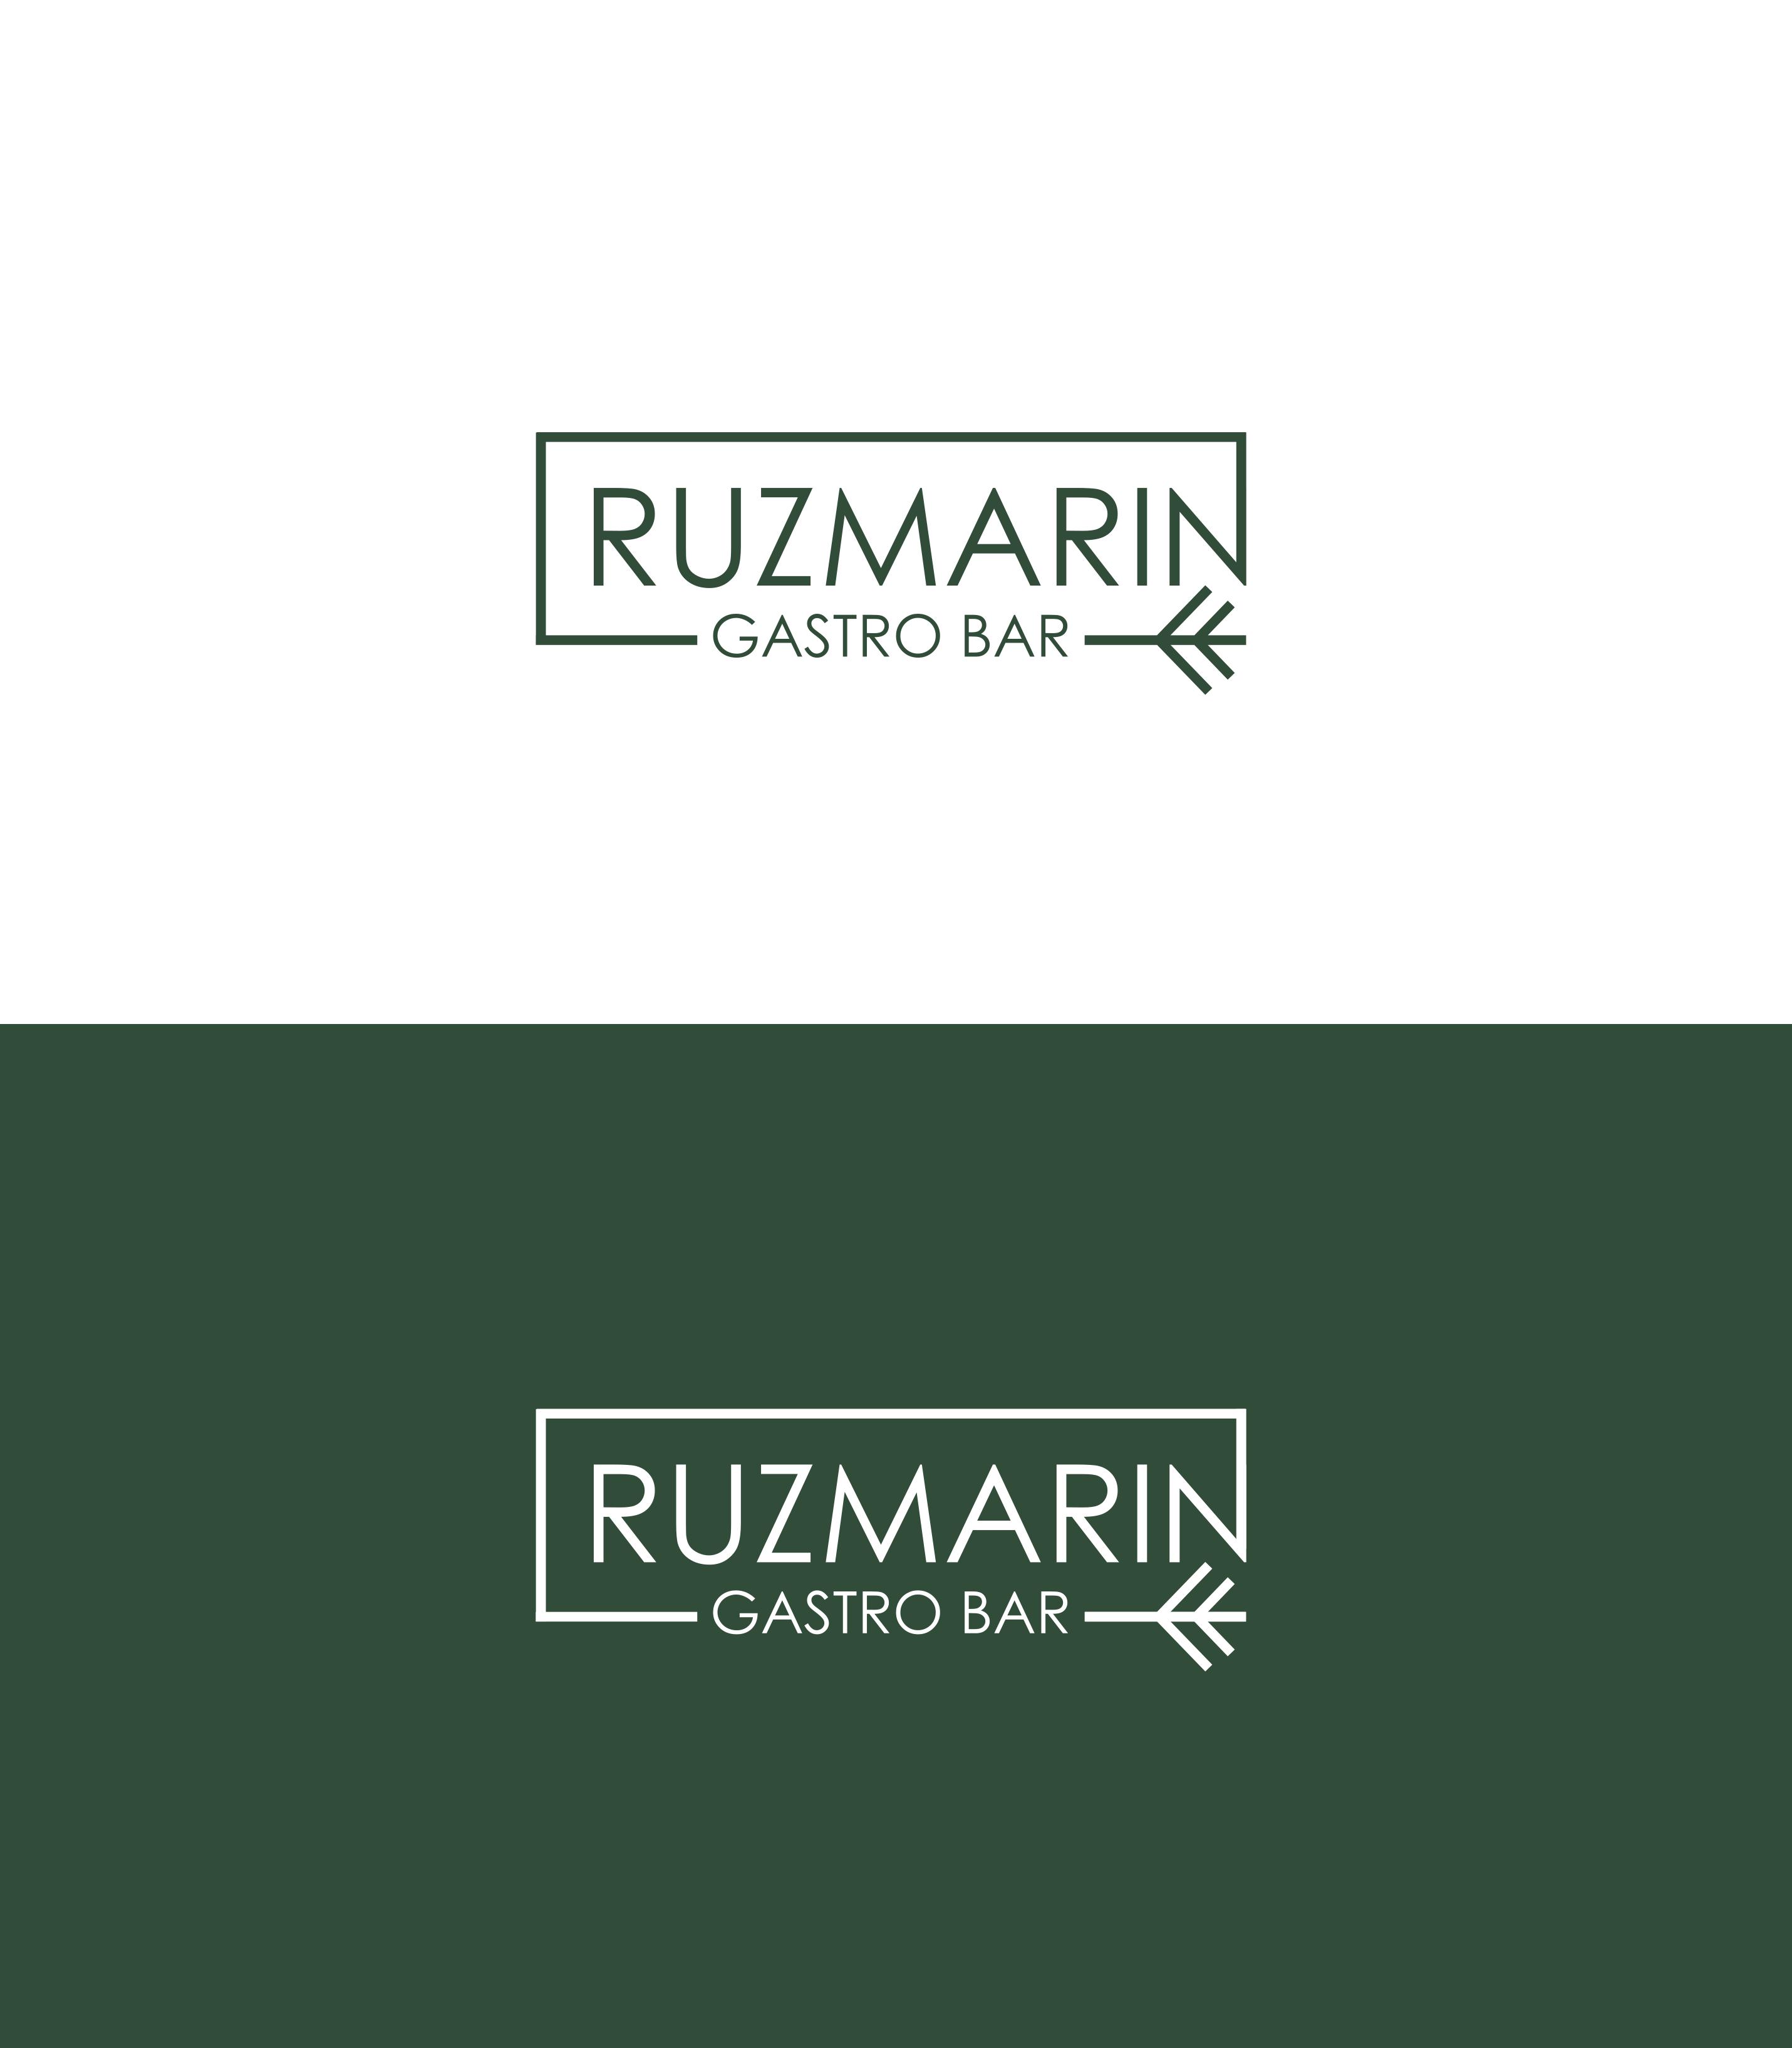 ROZMARIN ( 1 место )